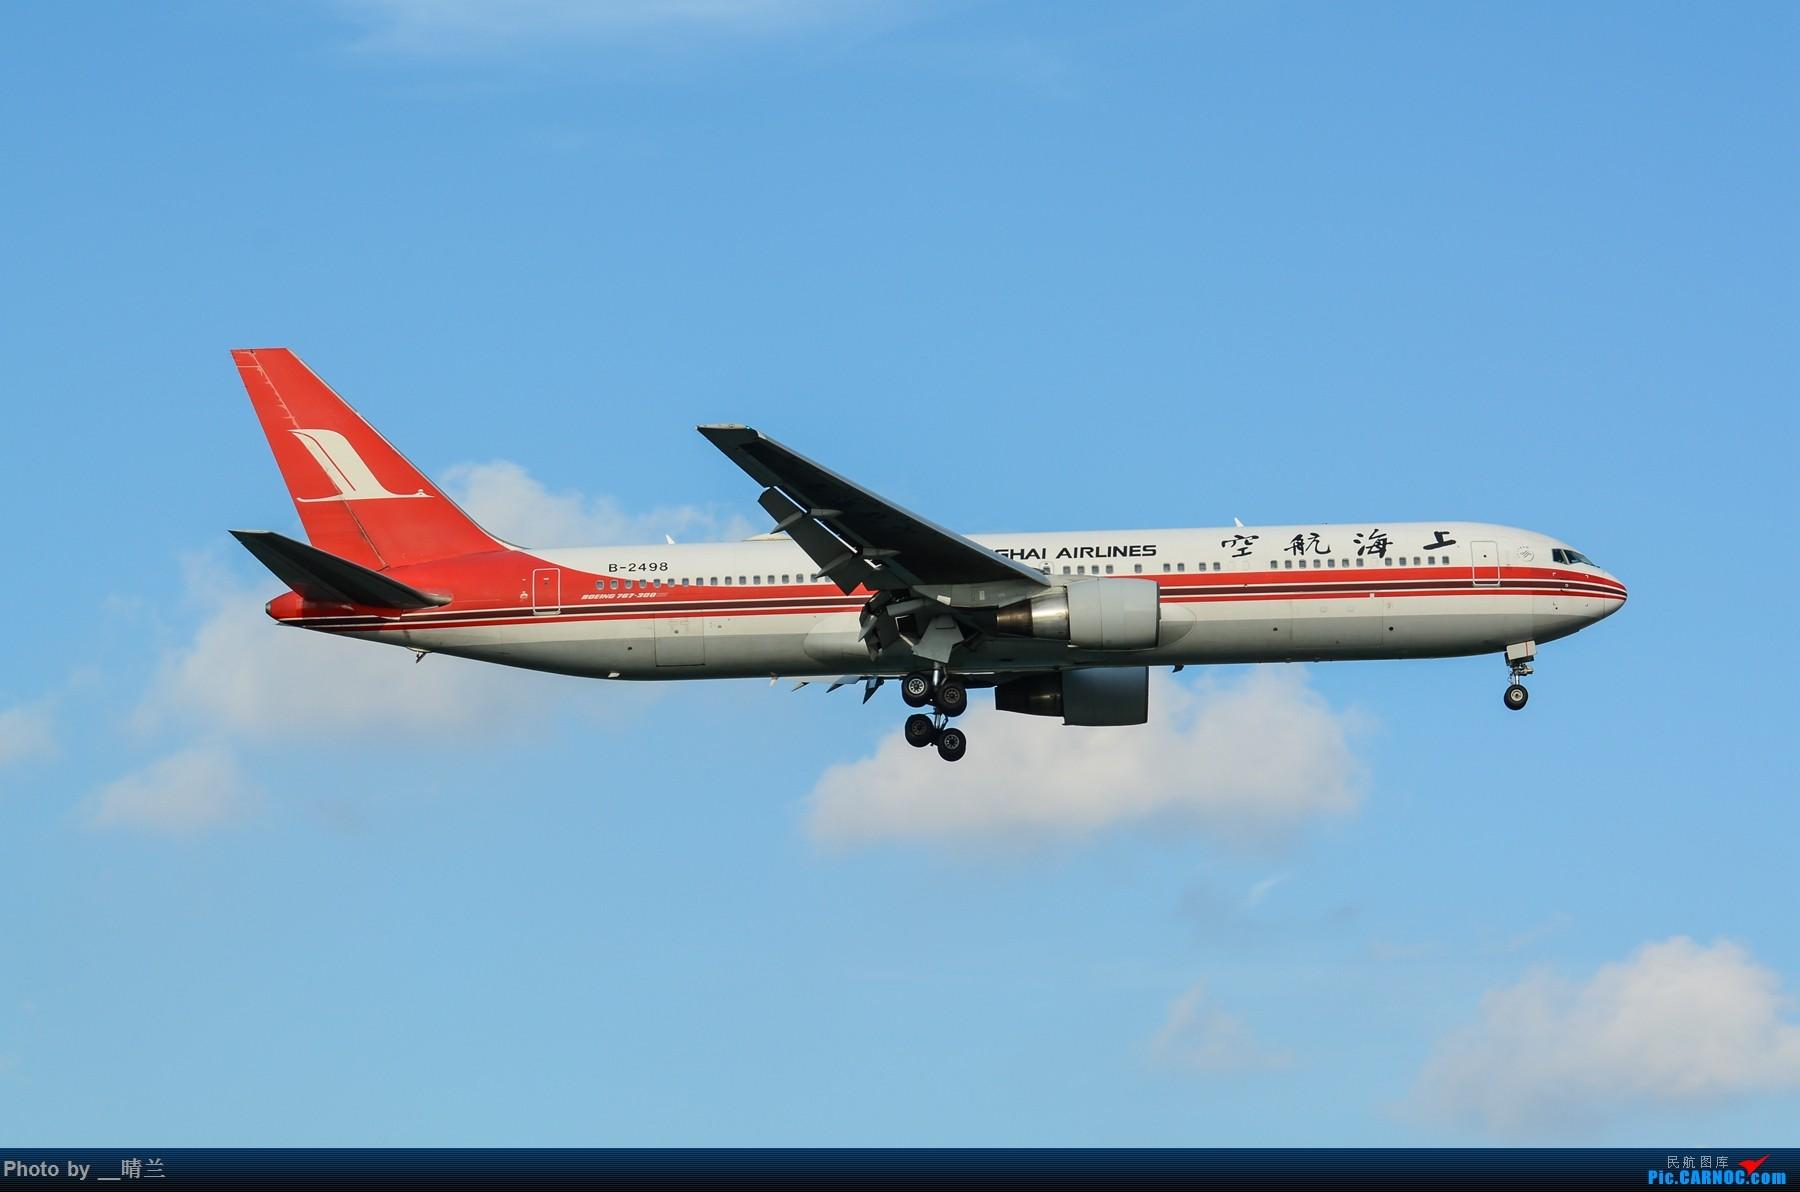 Re:[原创]果然昨天发了图,今天SHA就是大蓝天~~最开心的事莫过于基友们一起拍机! BOEING 767-300 B-2498 中国上海虹桥国际机场